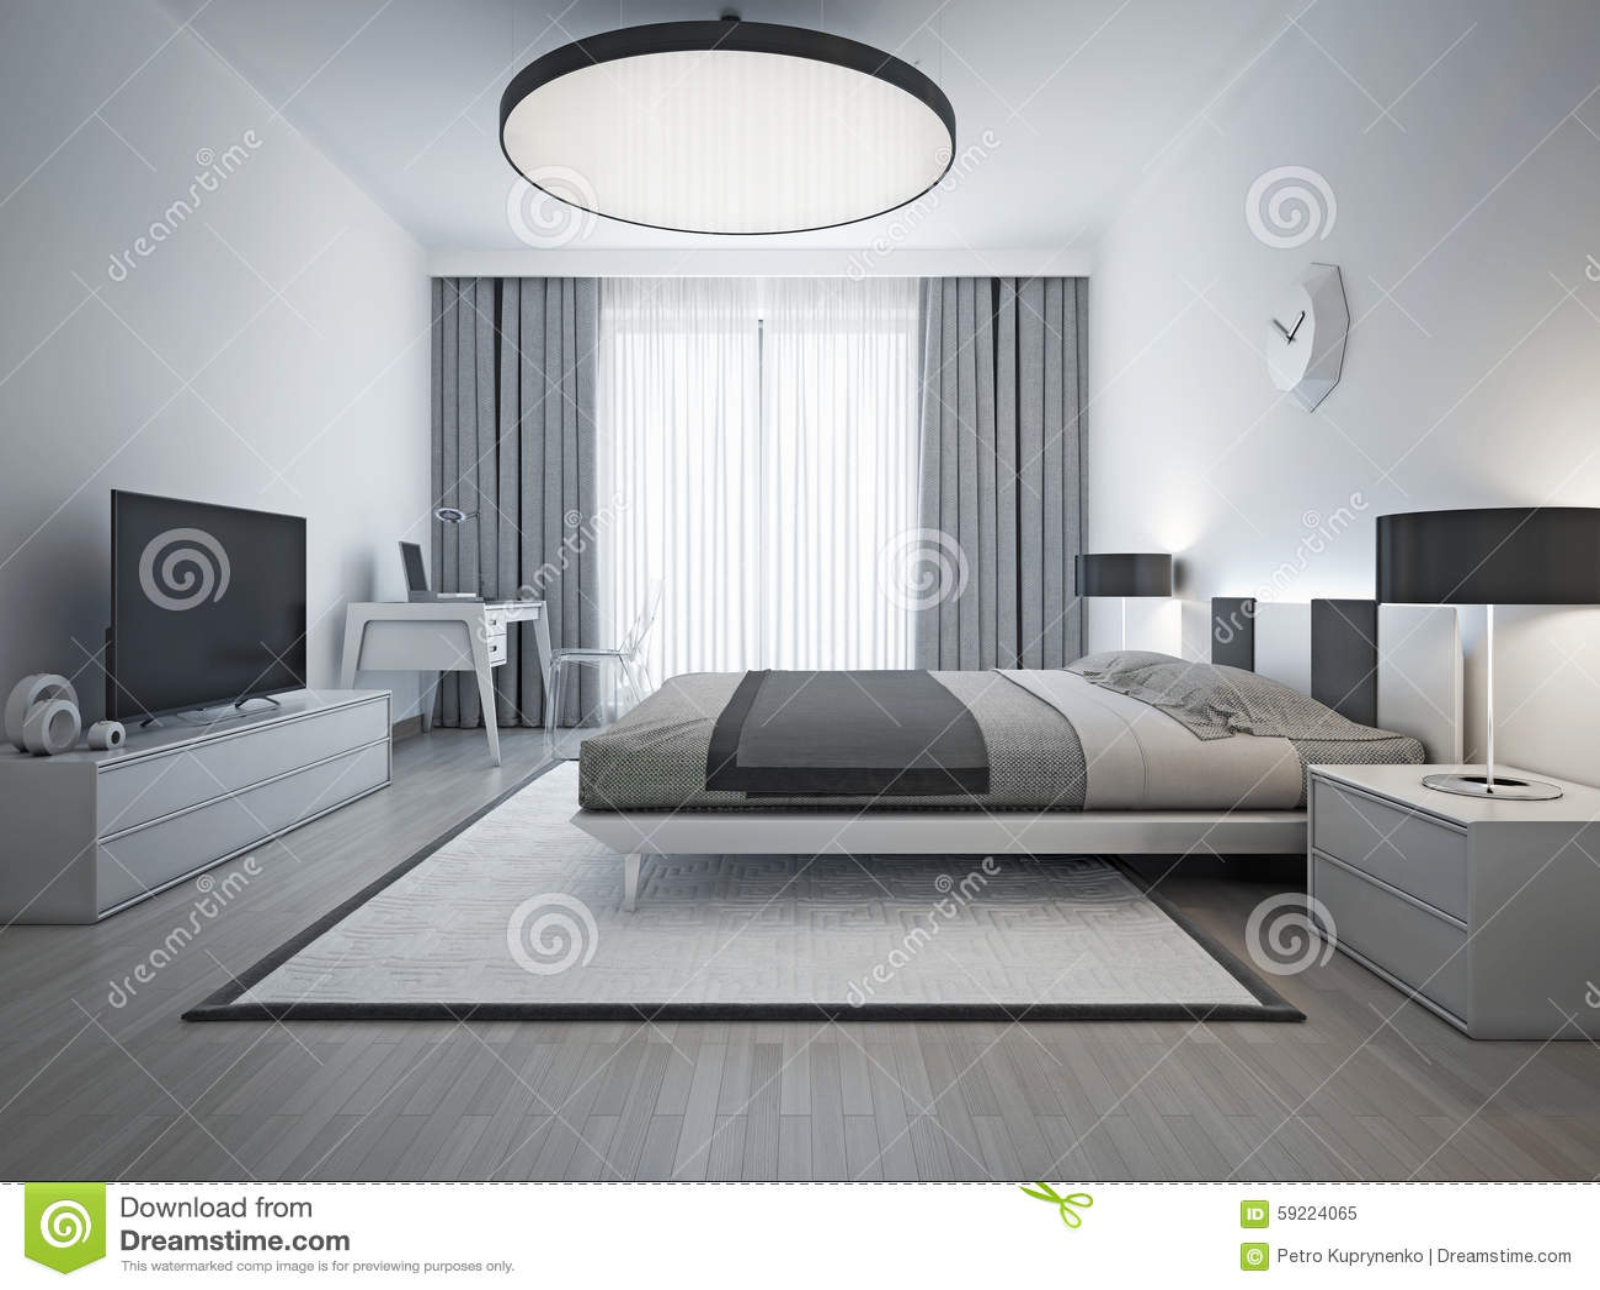 Elegant bedroom contemporary style